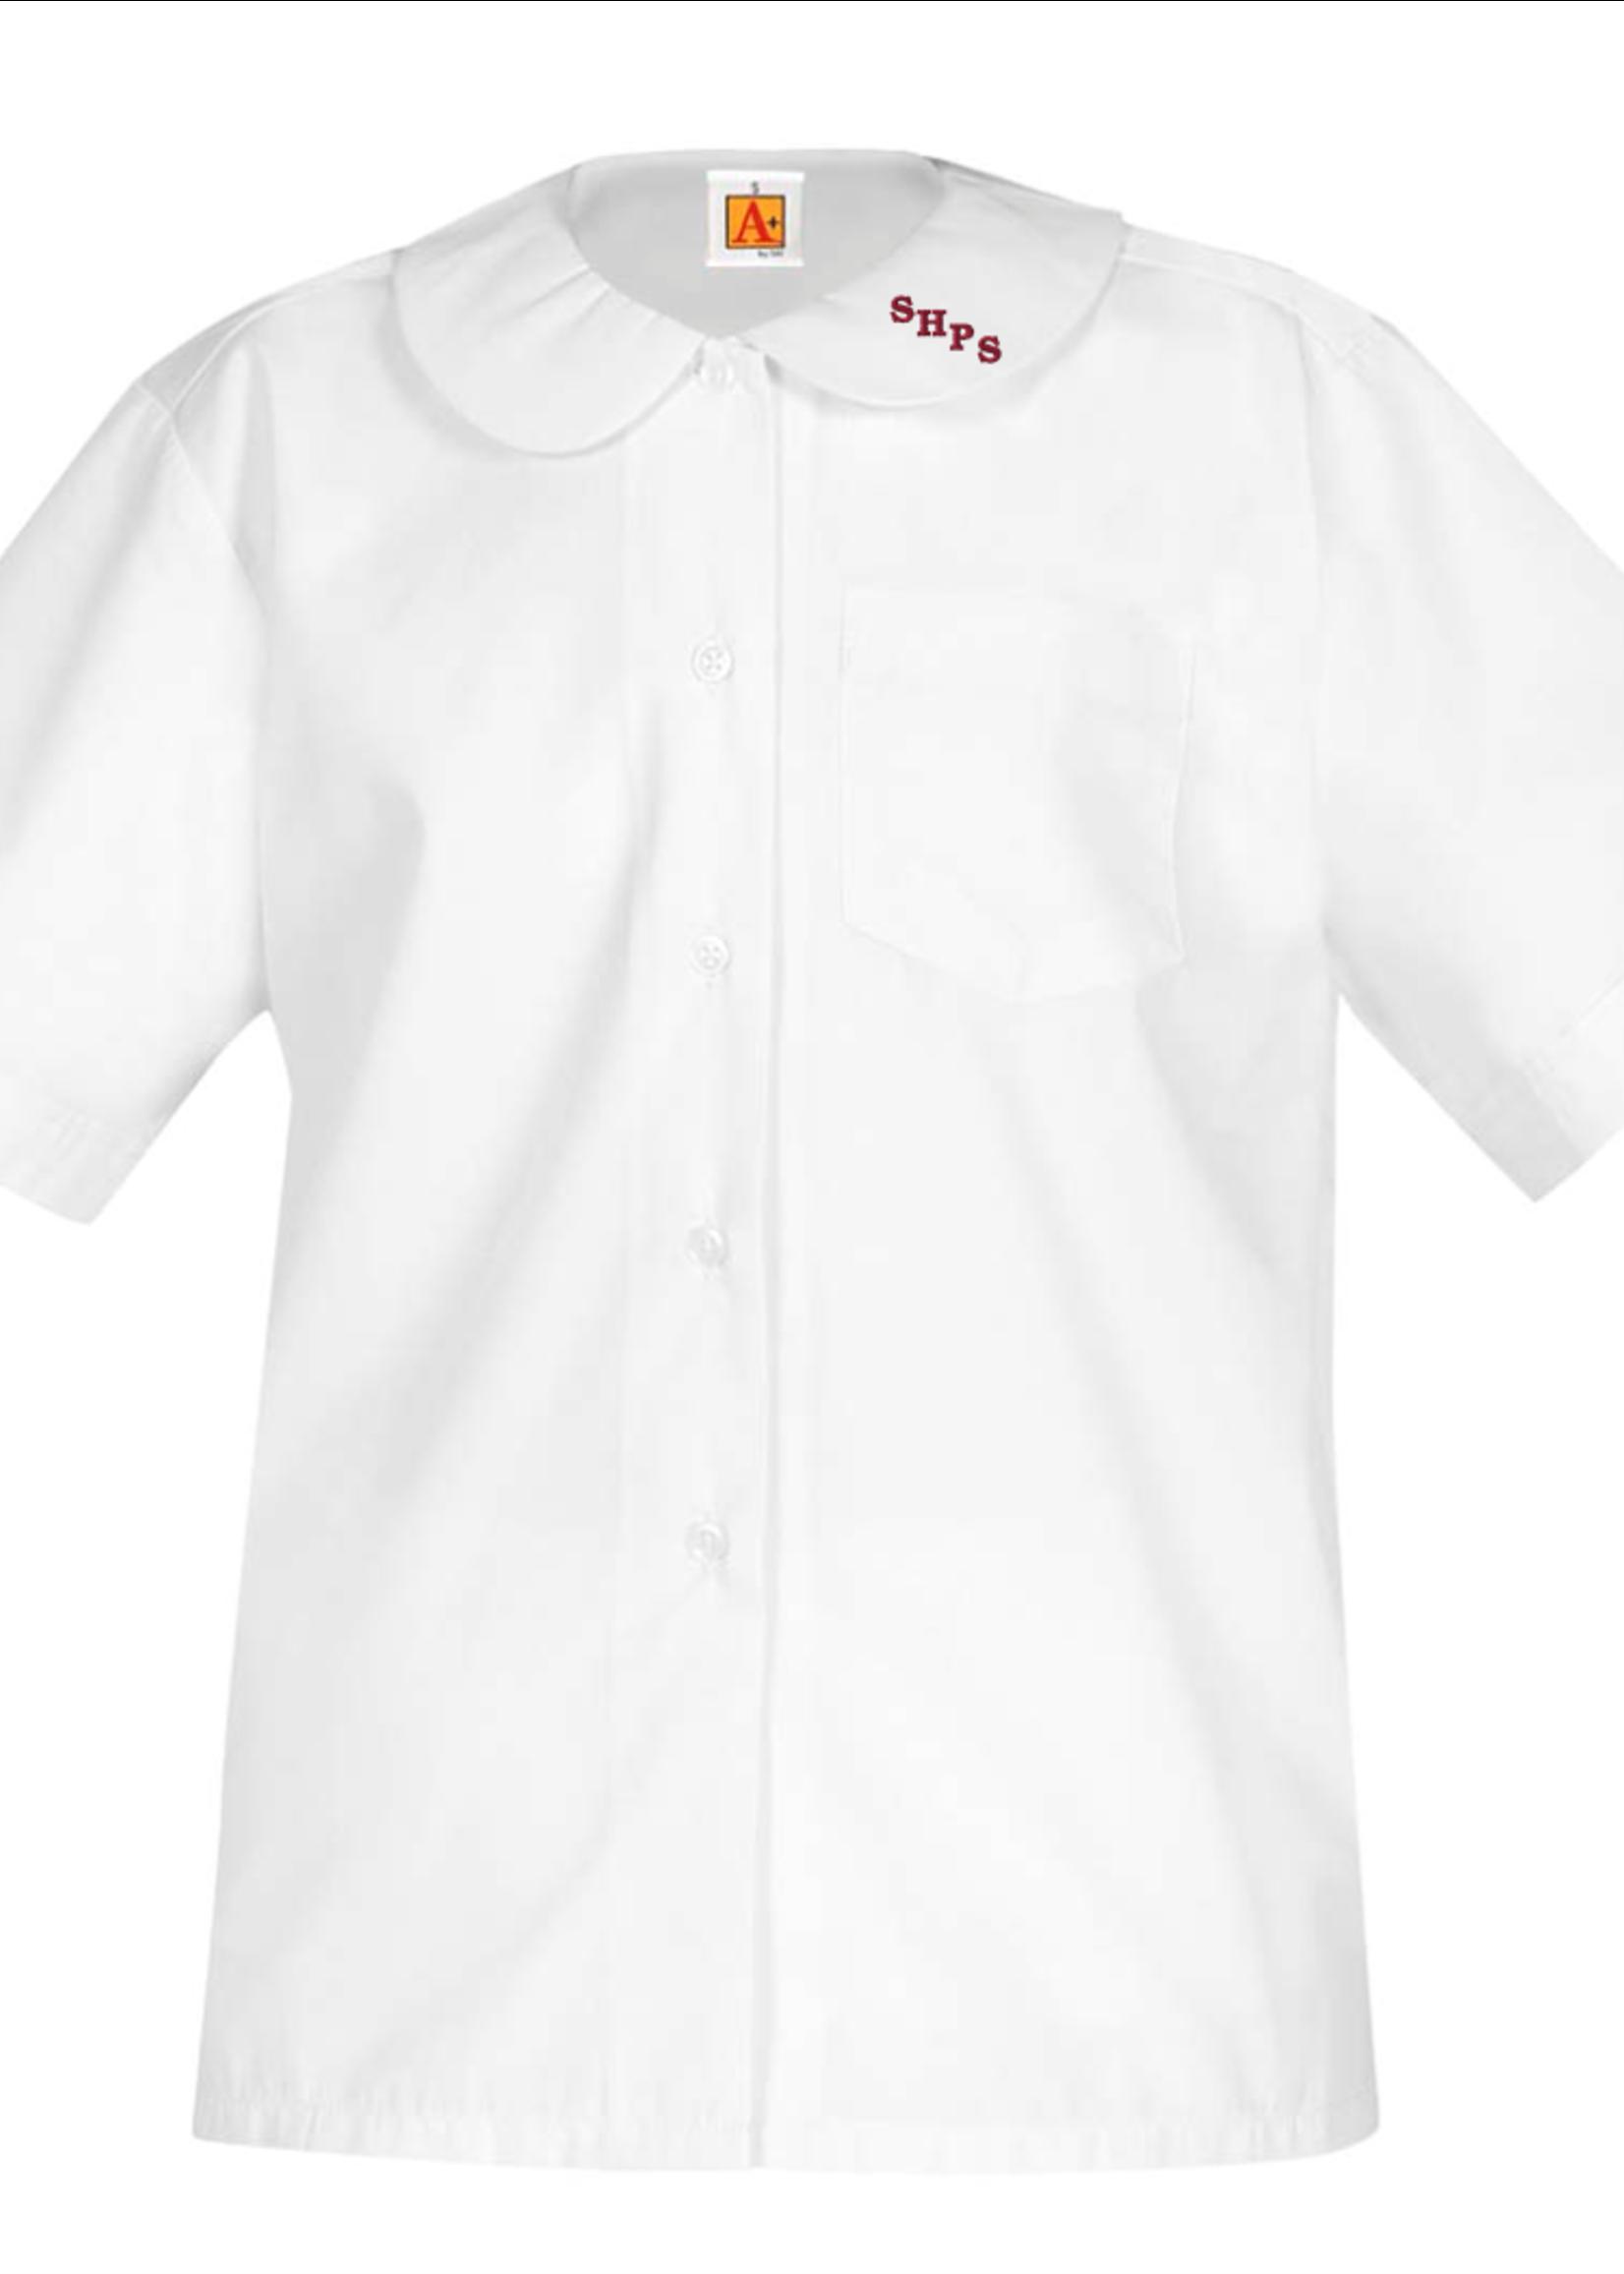 Null SHPS White Short Sleeve Peter Pan Blouse w/o pocket